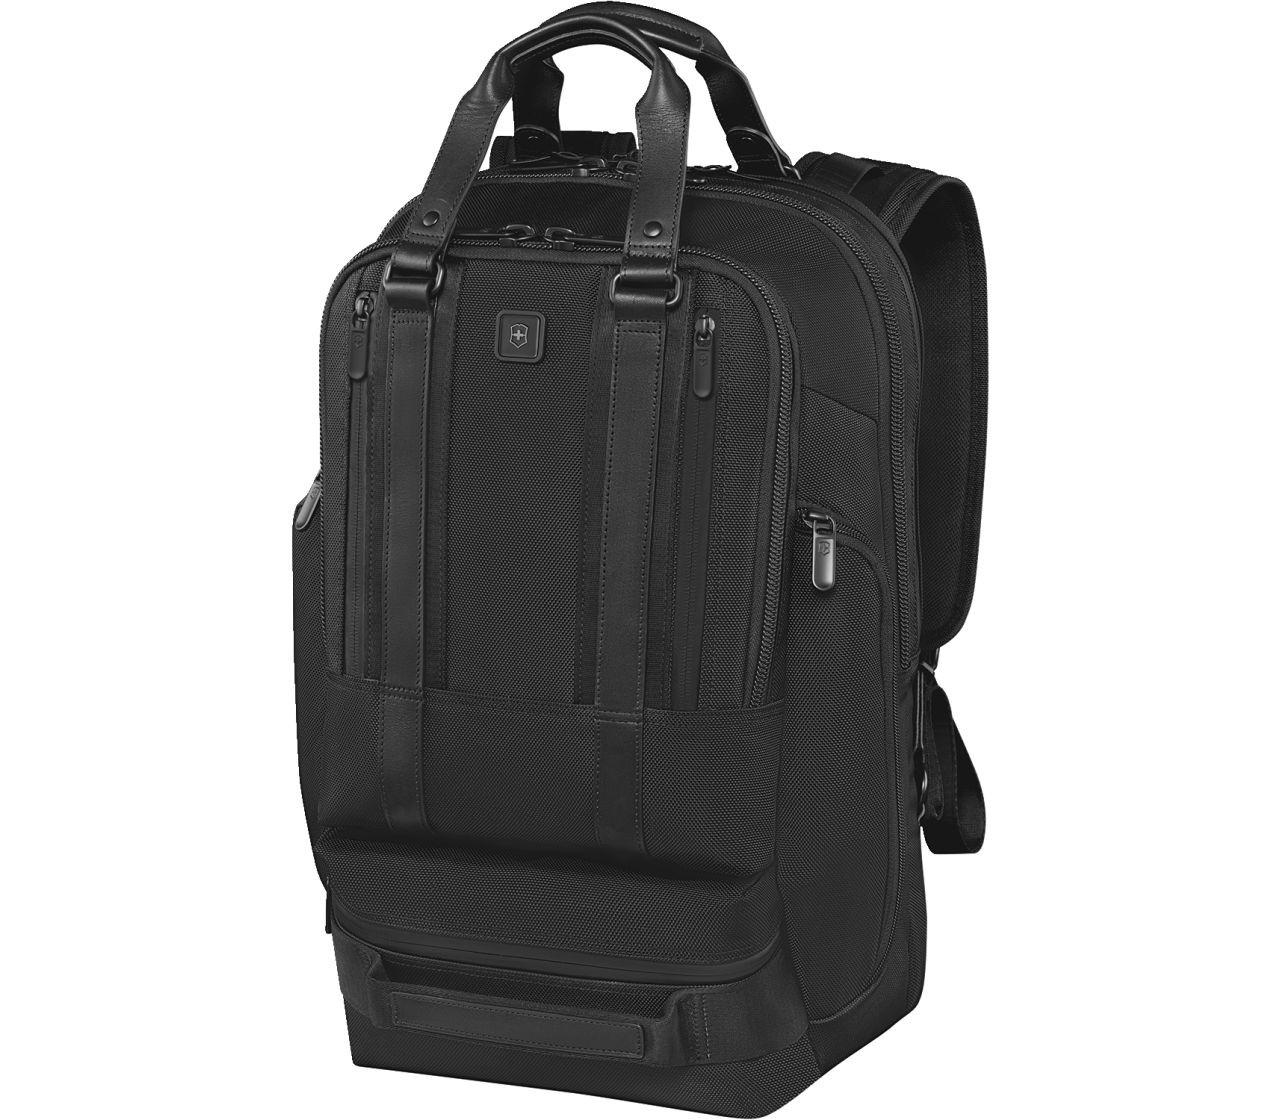 Bellevue 17 Business Backpack